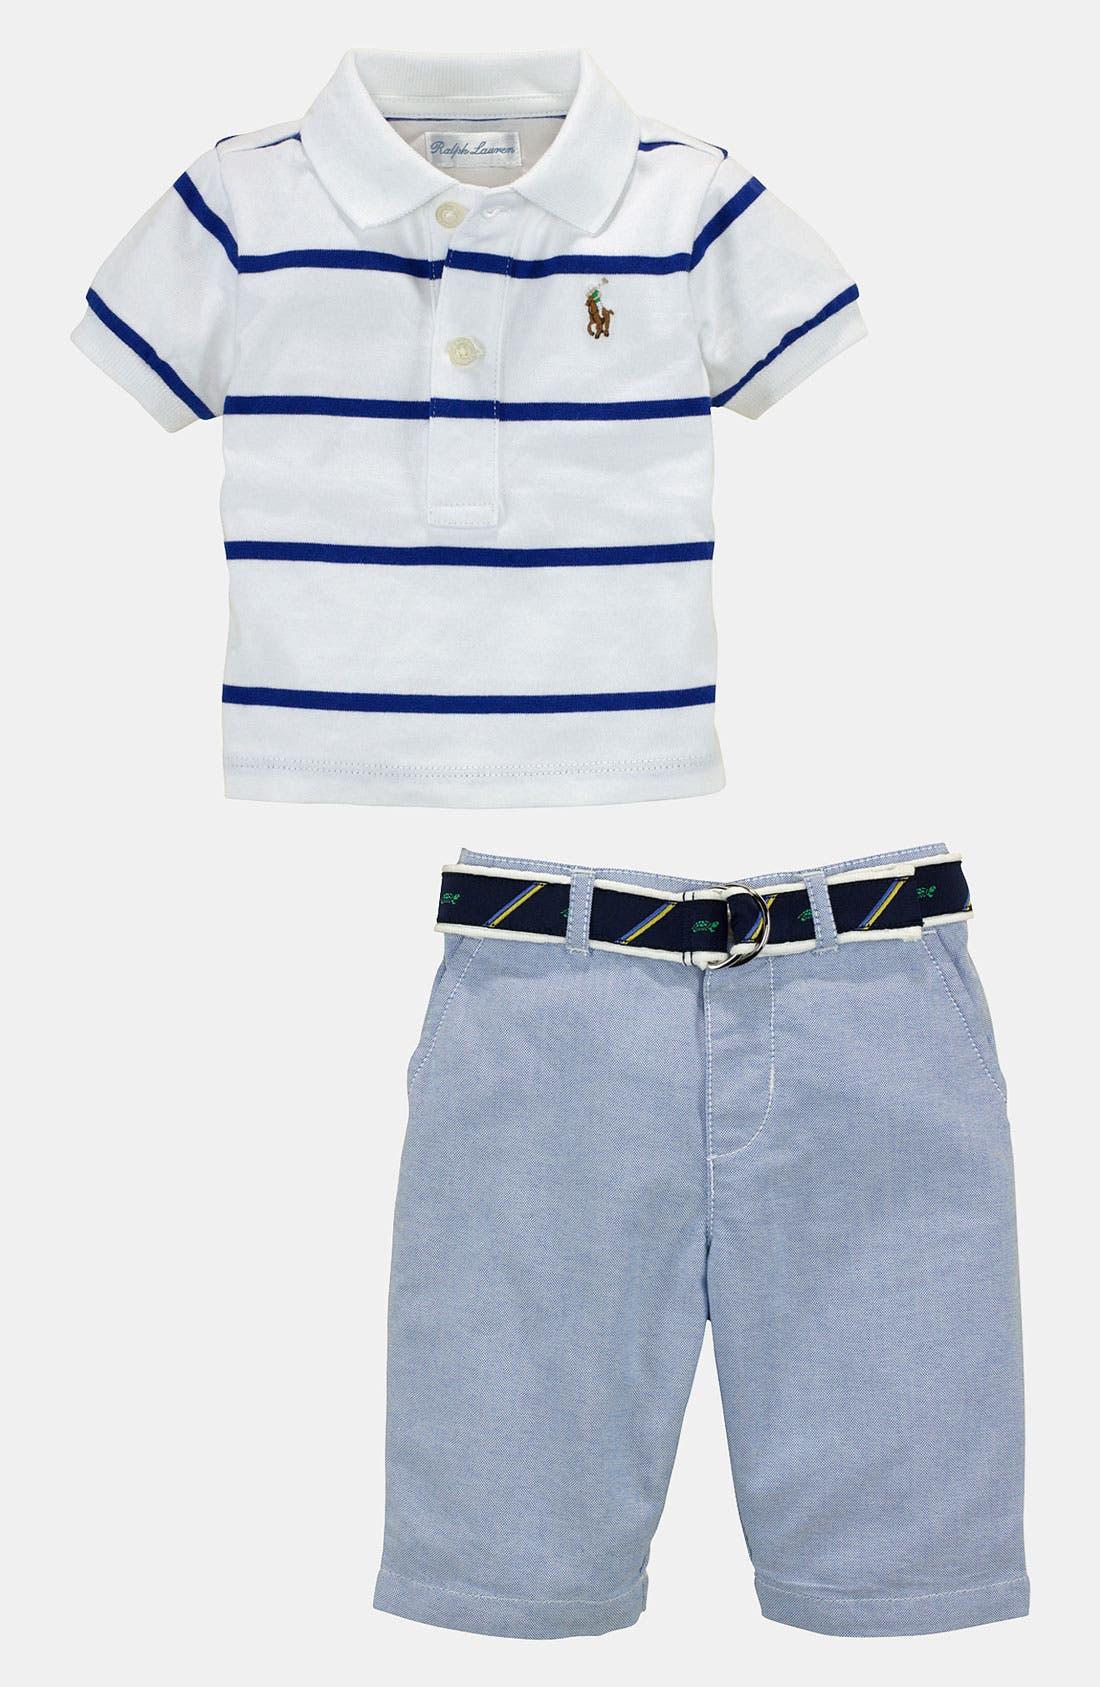 Main Image - Ralph Lauren Polo & Pants (Baby)